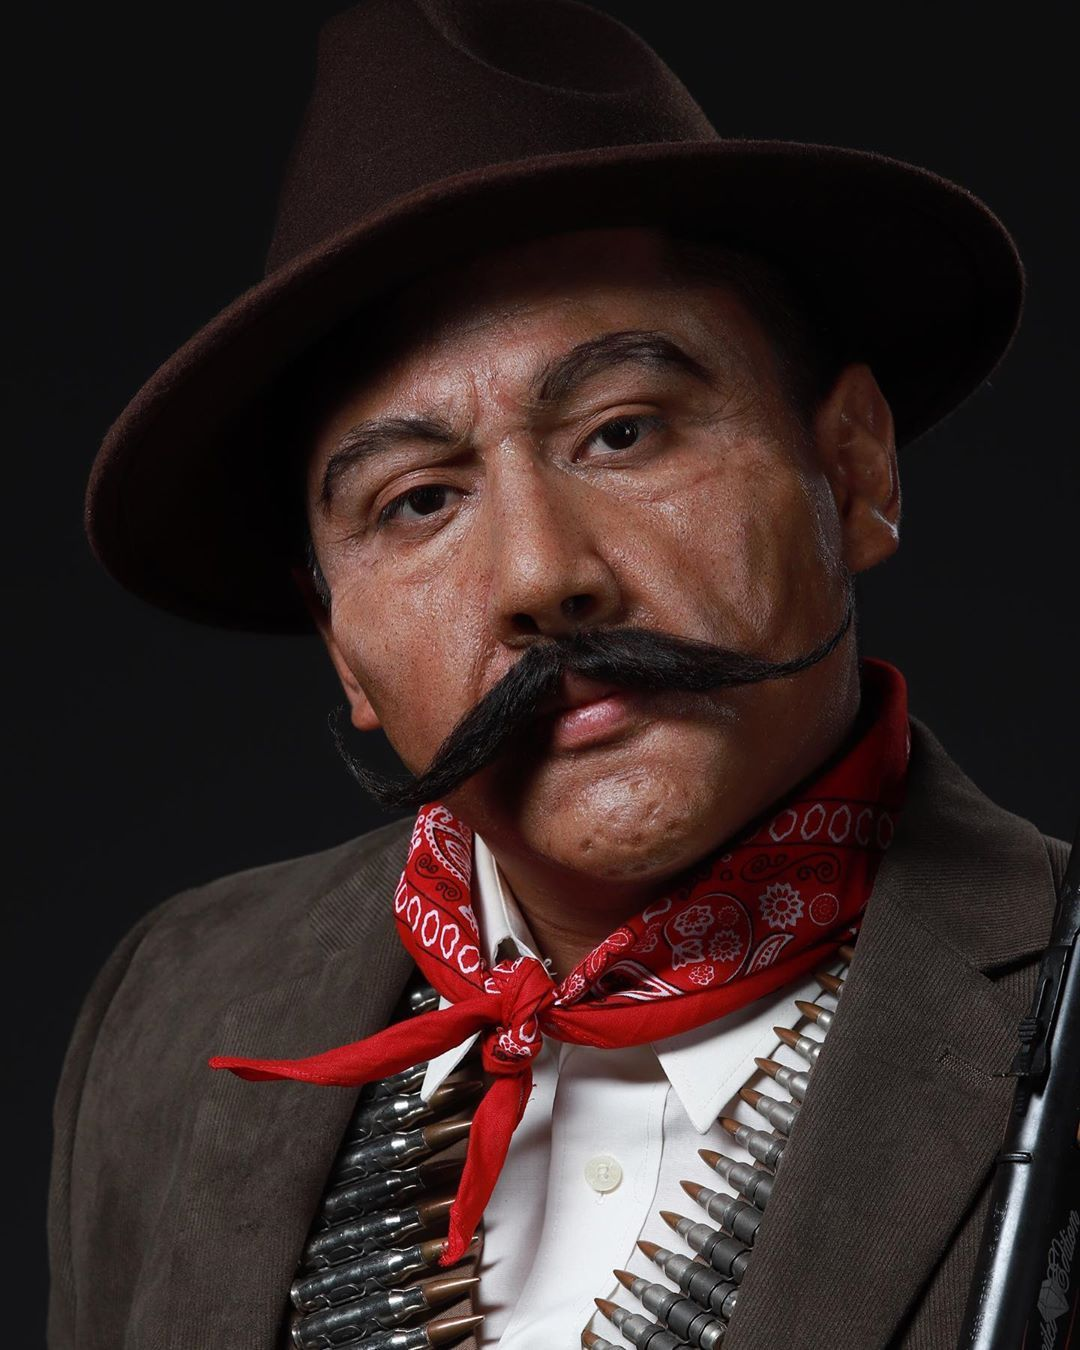 Meet General Pancho Villa! Old age makeup sculpted